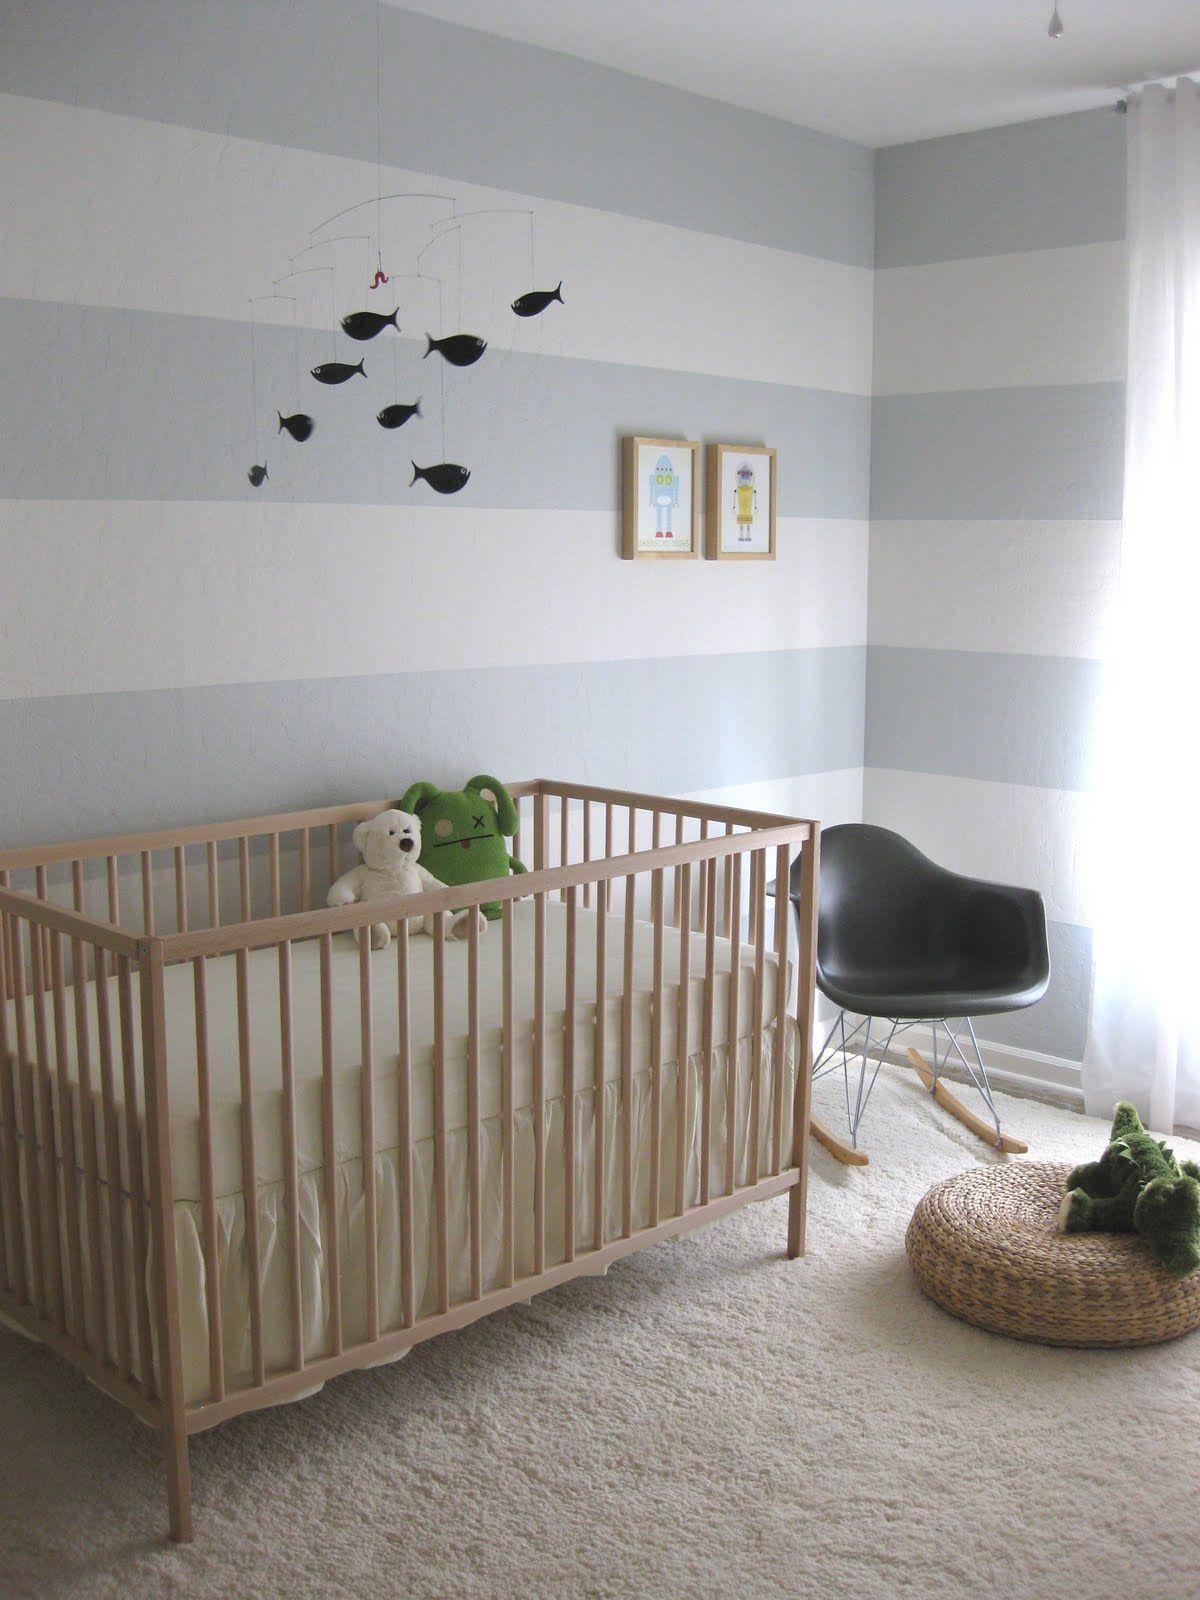 modern ikea sniglar crib with flowy crib skirt  for the home  - modern ikea sniglar crib with flowy crib skirt